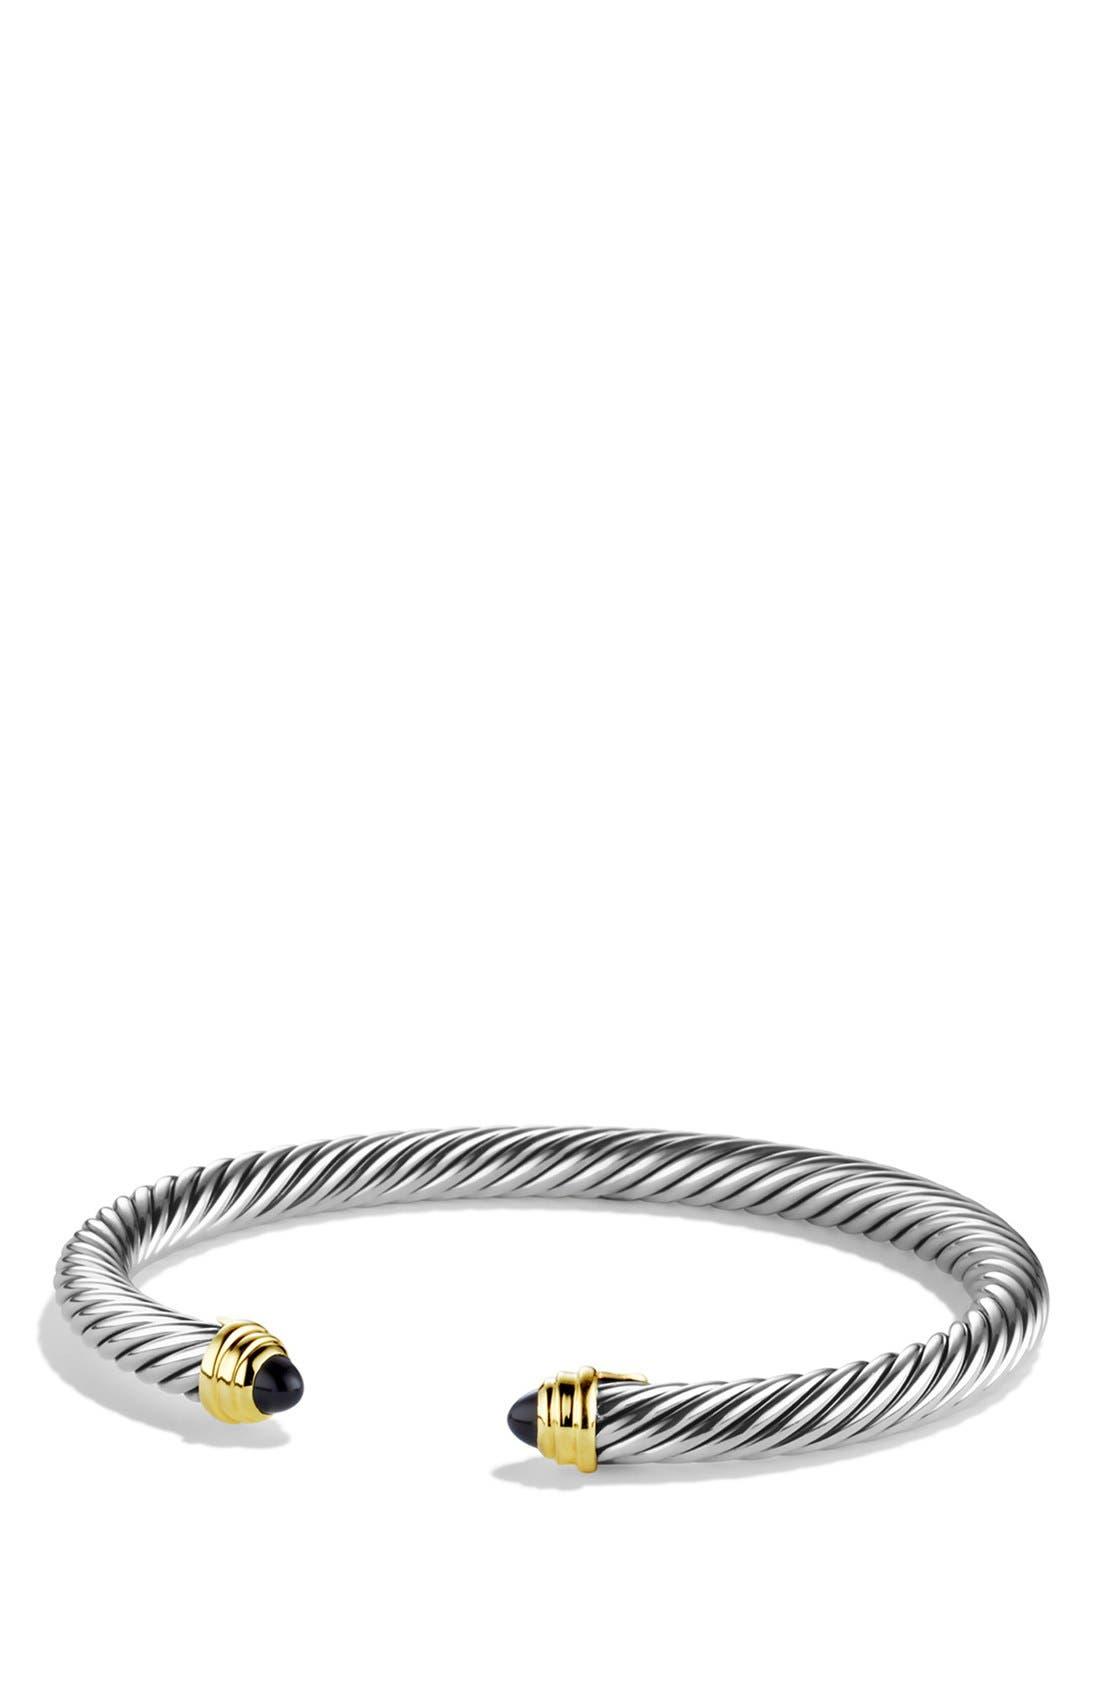 DAVID YURMAN, Cable Classics Bracelet with Semiprecious Stones & 14K Gold, 5mm, Main thumbnail 1, color, BLACK ONYX